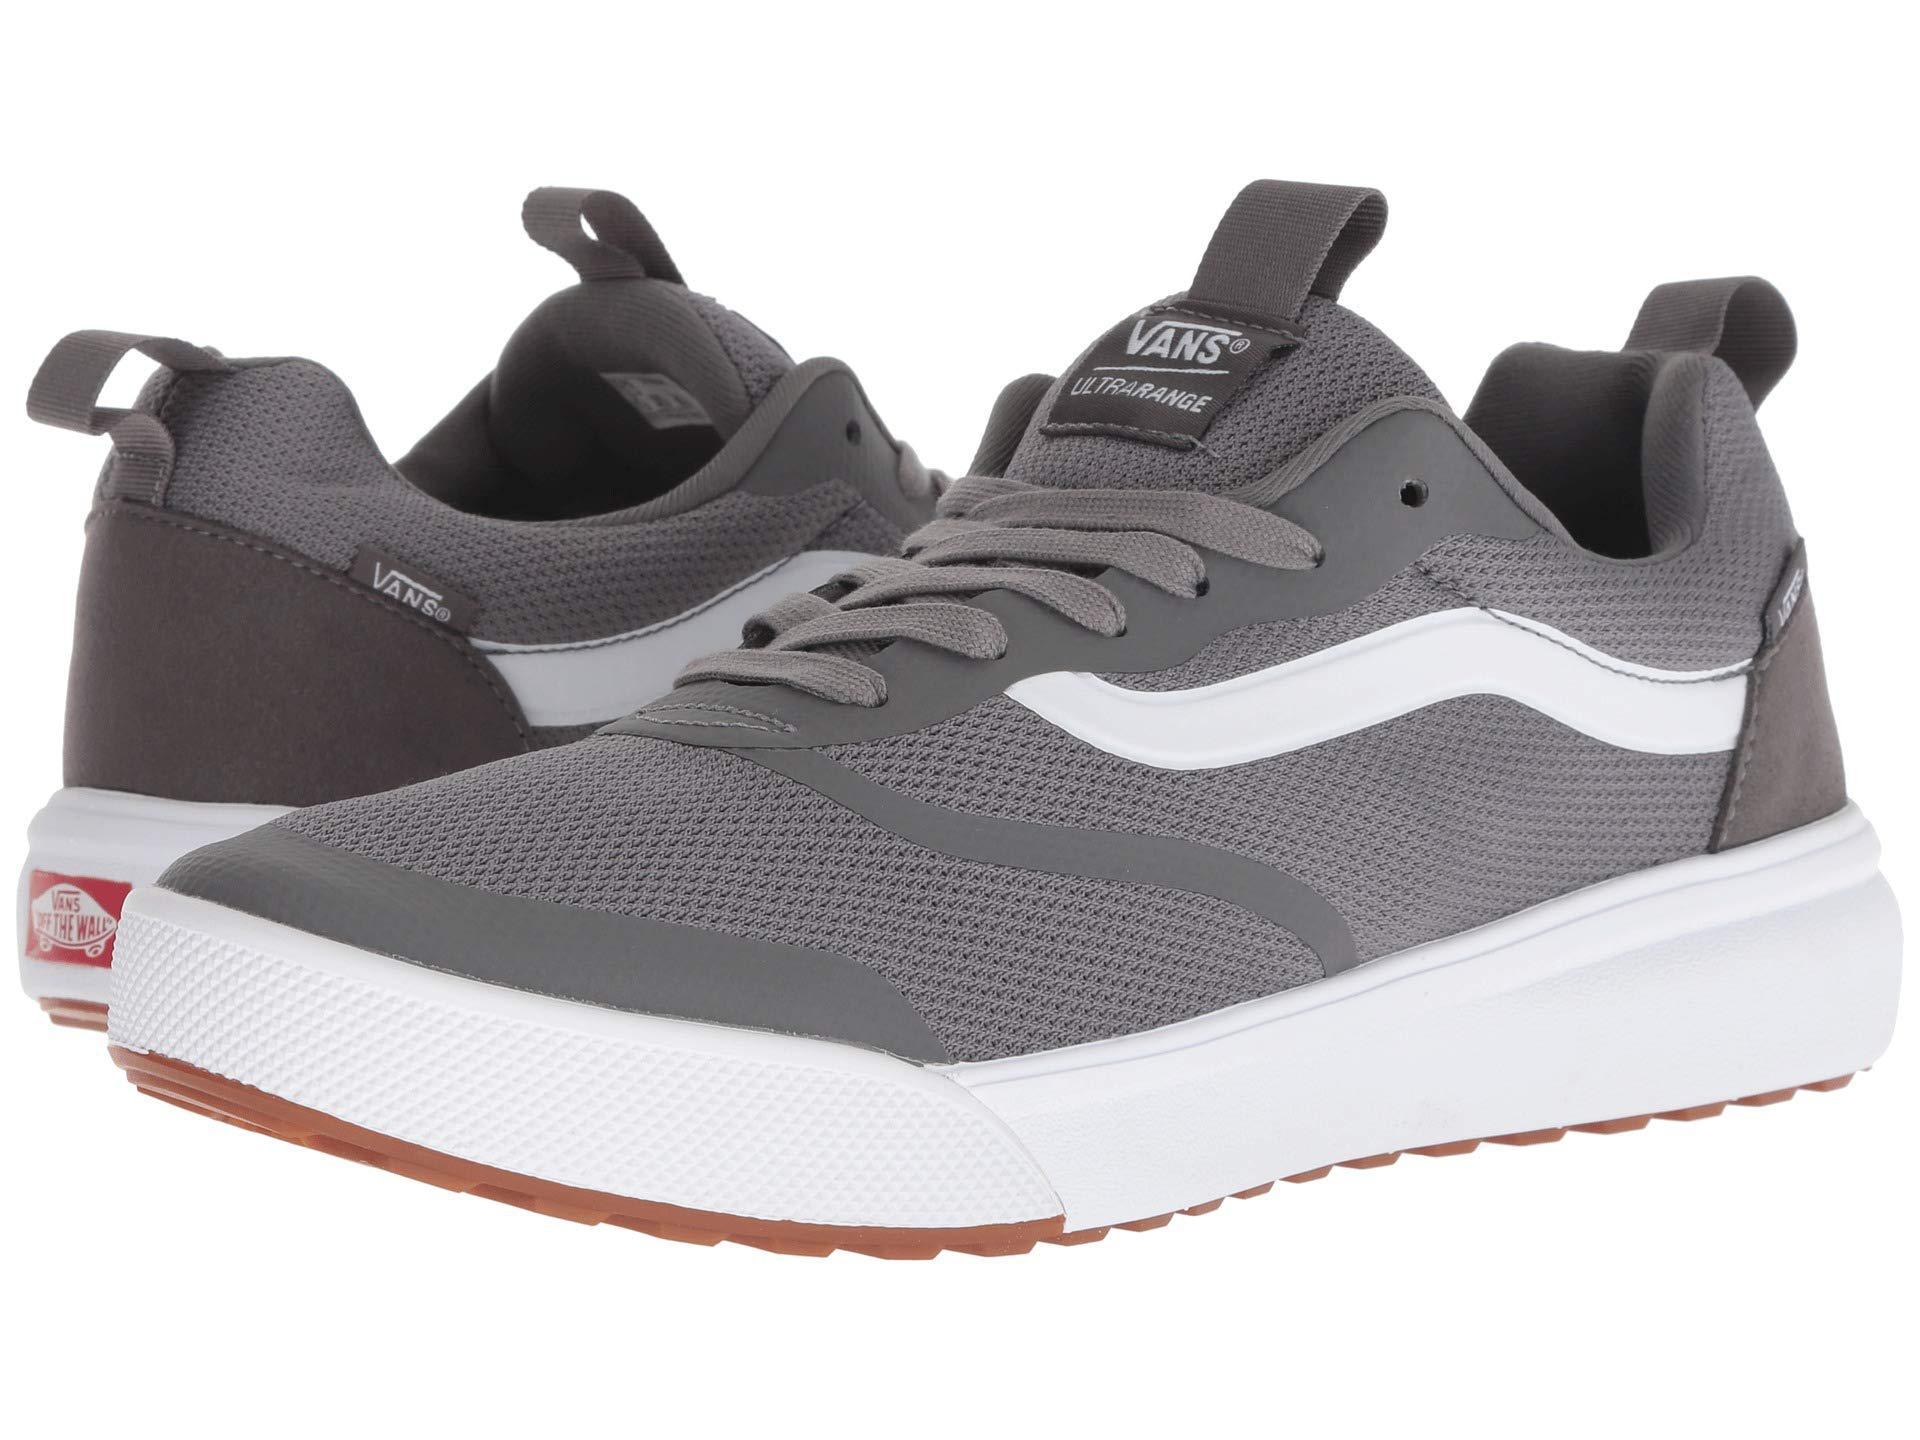 Lyst - Vans Ultrarange Rapidweld  18 (black black) Skate Shoes for Men 9c7b4c14b